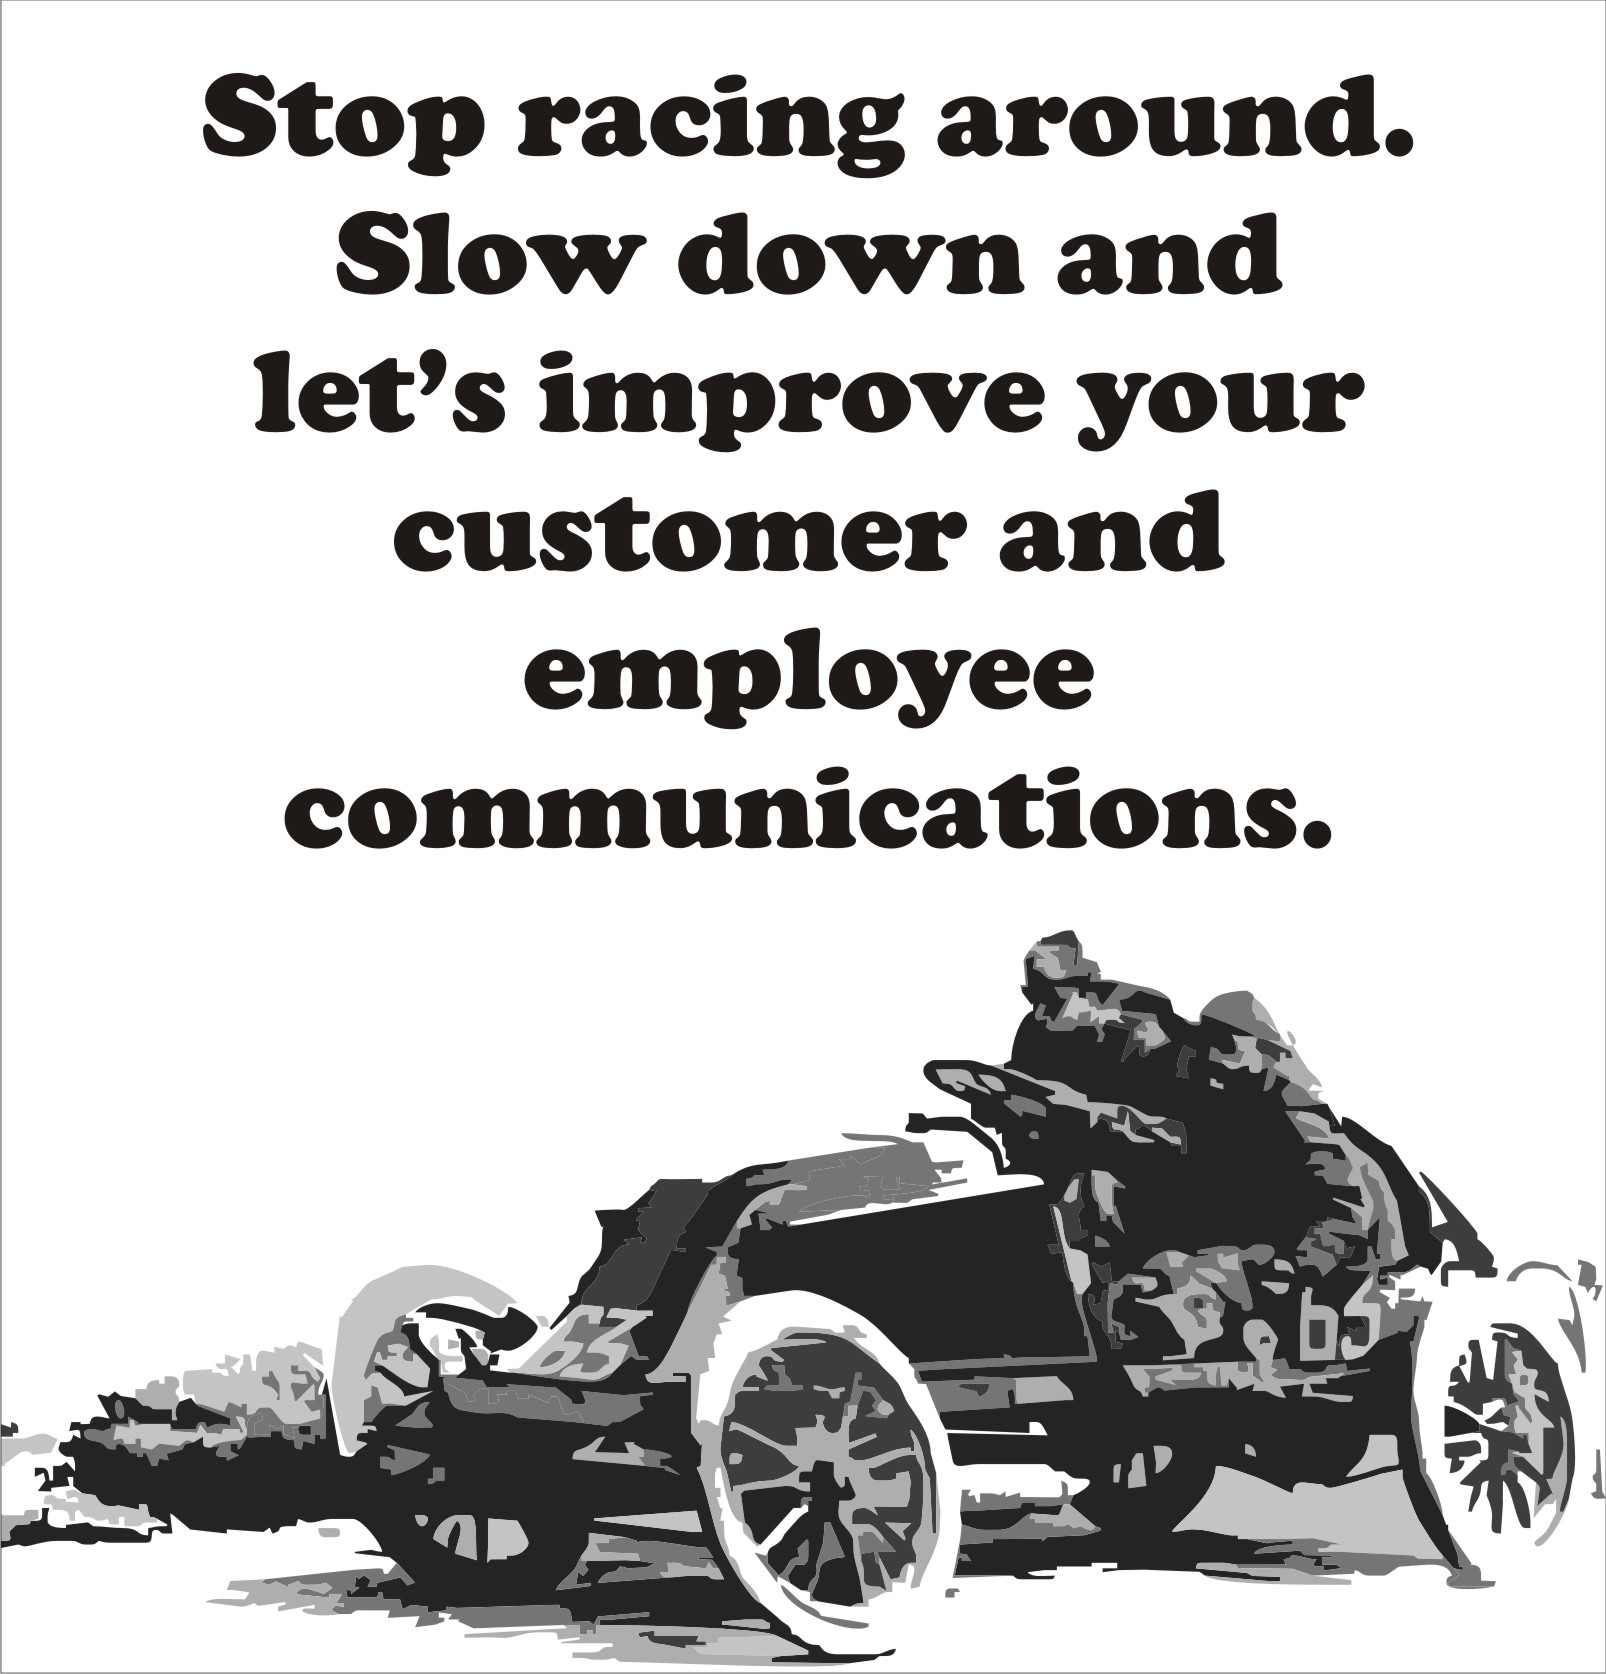 improvecommunications